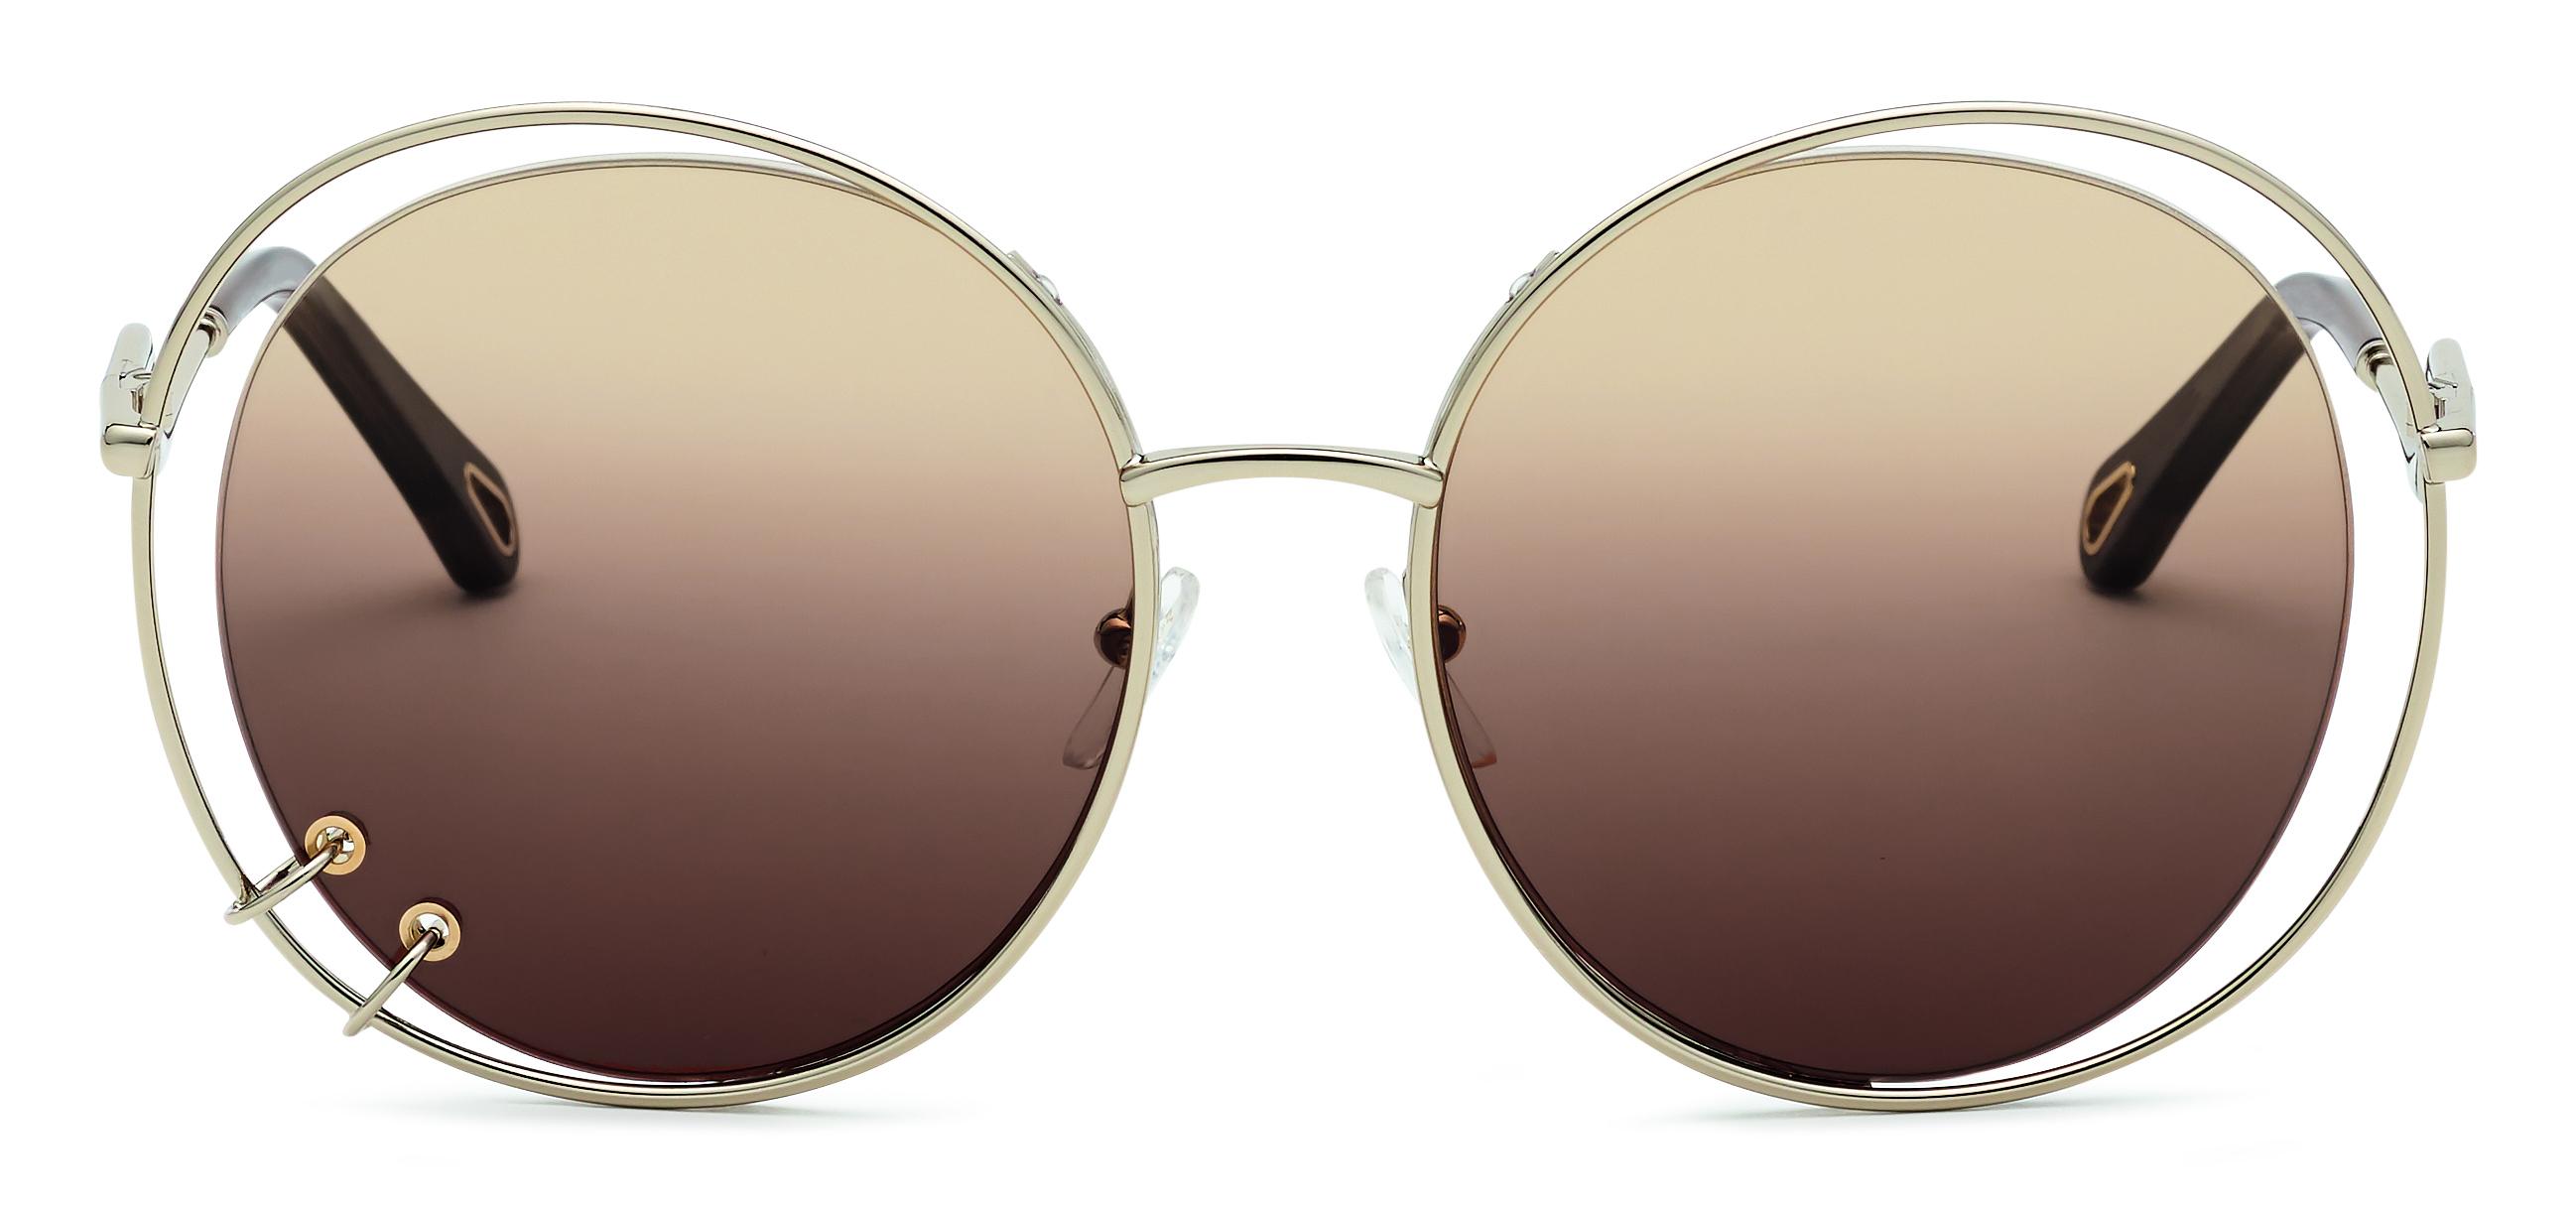 Chloé zonnebril met piercing